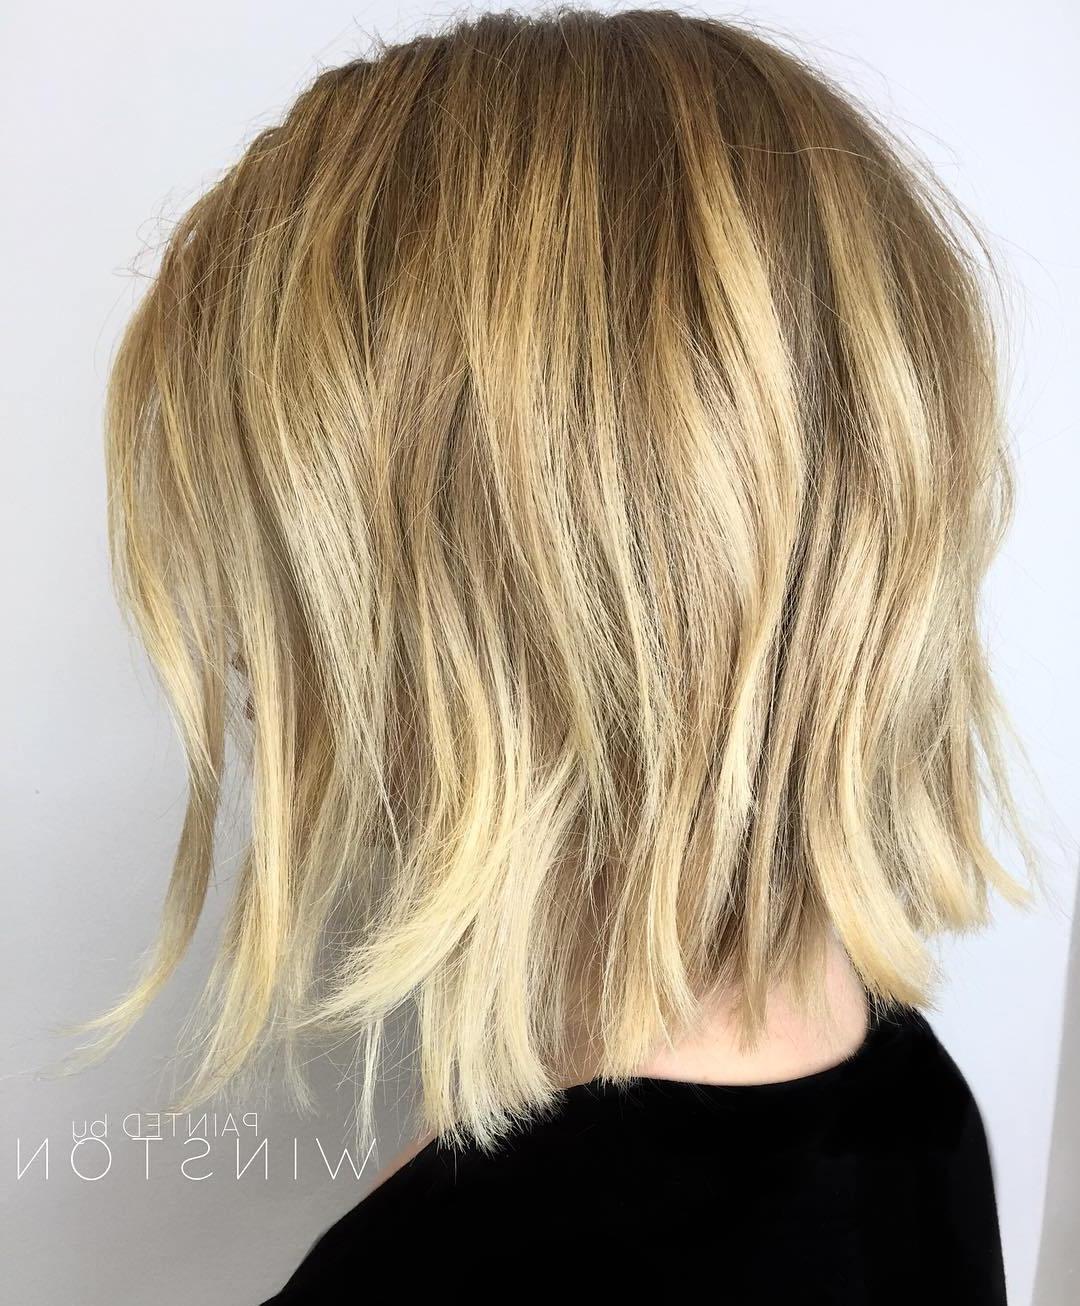 50 Choppy Bobs Too Damn Good Not To Copy – Hair Adviser With Regard To Voluminous Short Choppy Blonde Bob Hairstyles (View 9 of 20)